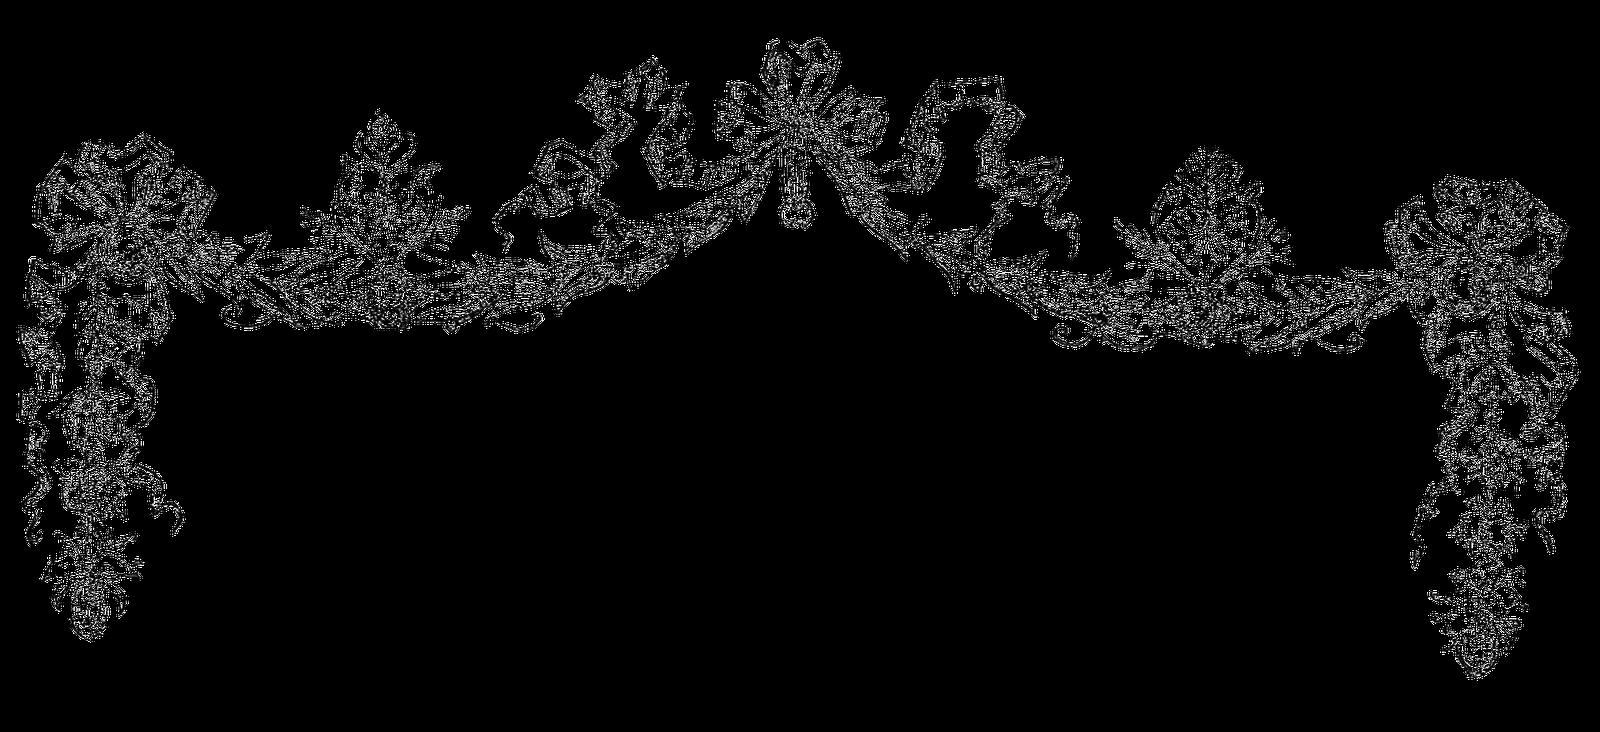 Black and white flower banner clipart banner royalty free download Flower Clip art - vintage border 1600*732 transprent Png Free ... banner royalty free download